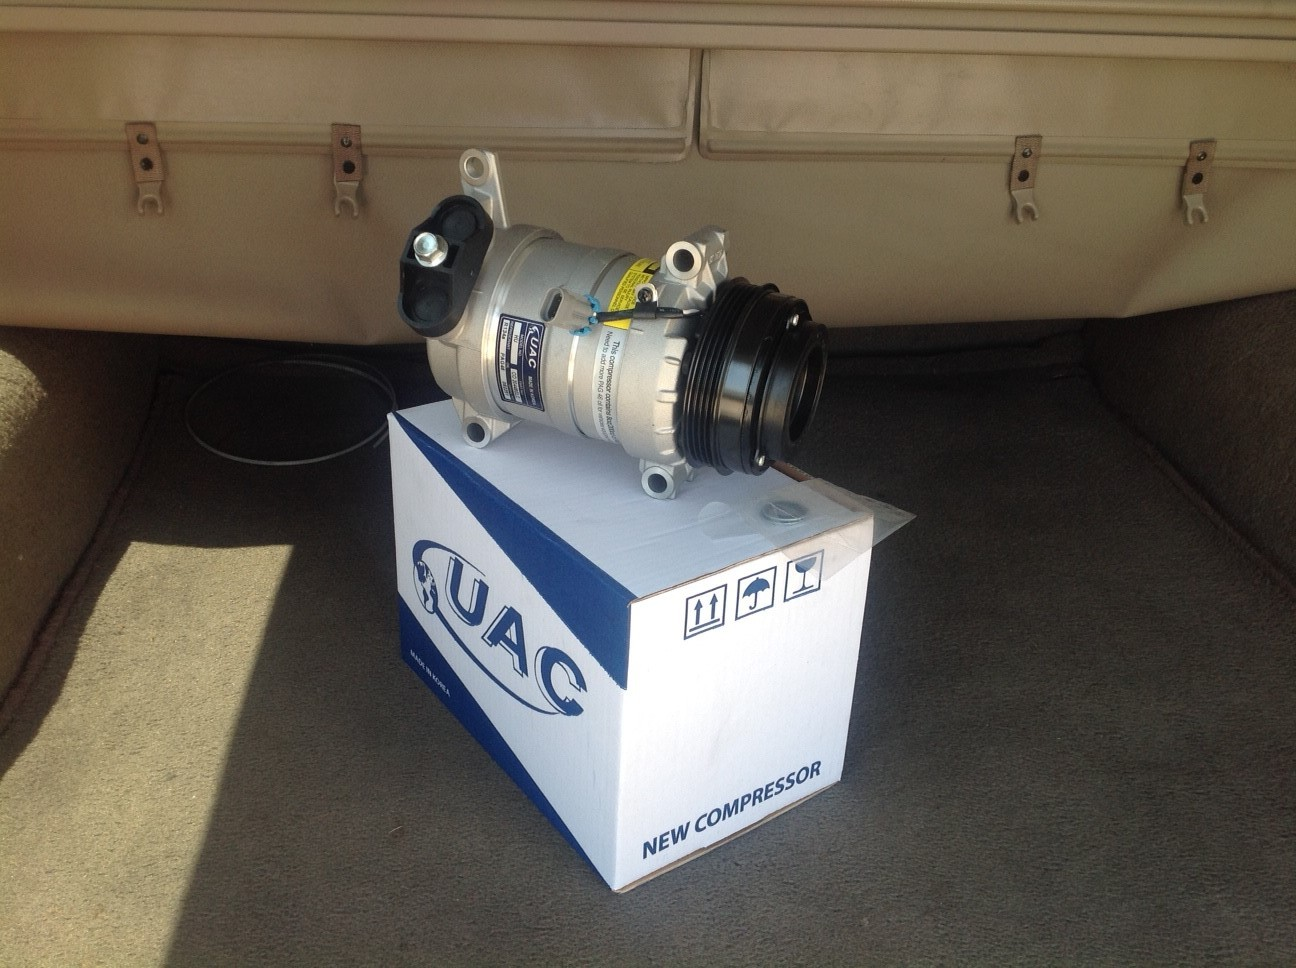 99-02 Chevy Chevrolet Silverado AC Air Conditioning Compressor Repair Part Kit